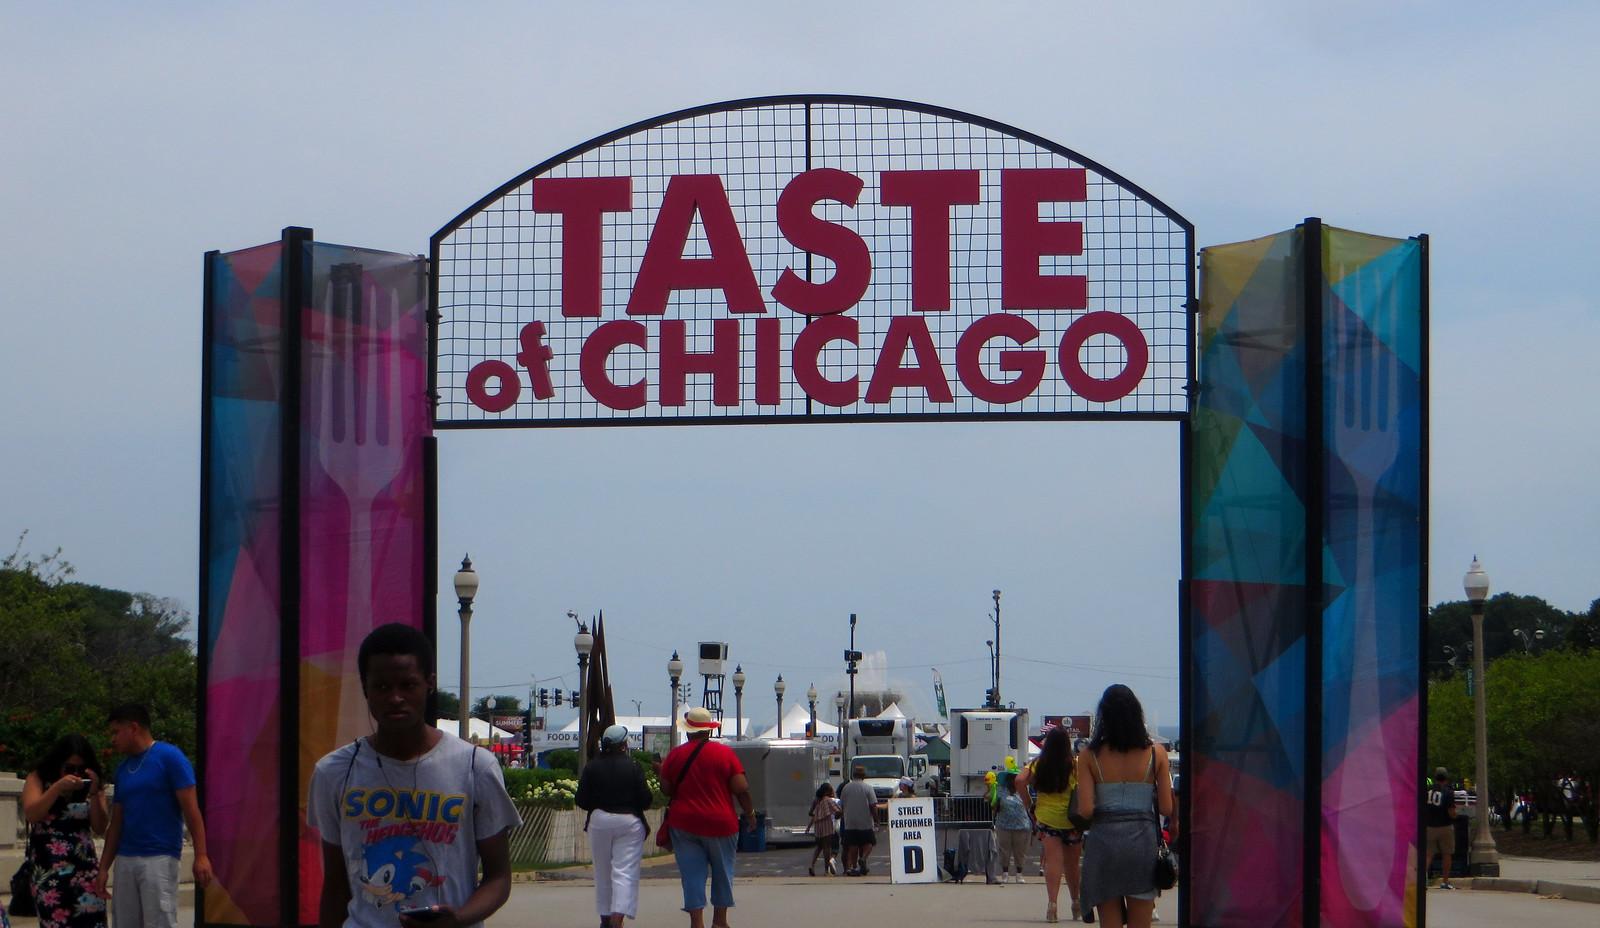 Taste of Chicago, Grant Park, Chicago, Illinois